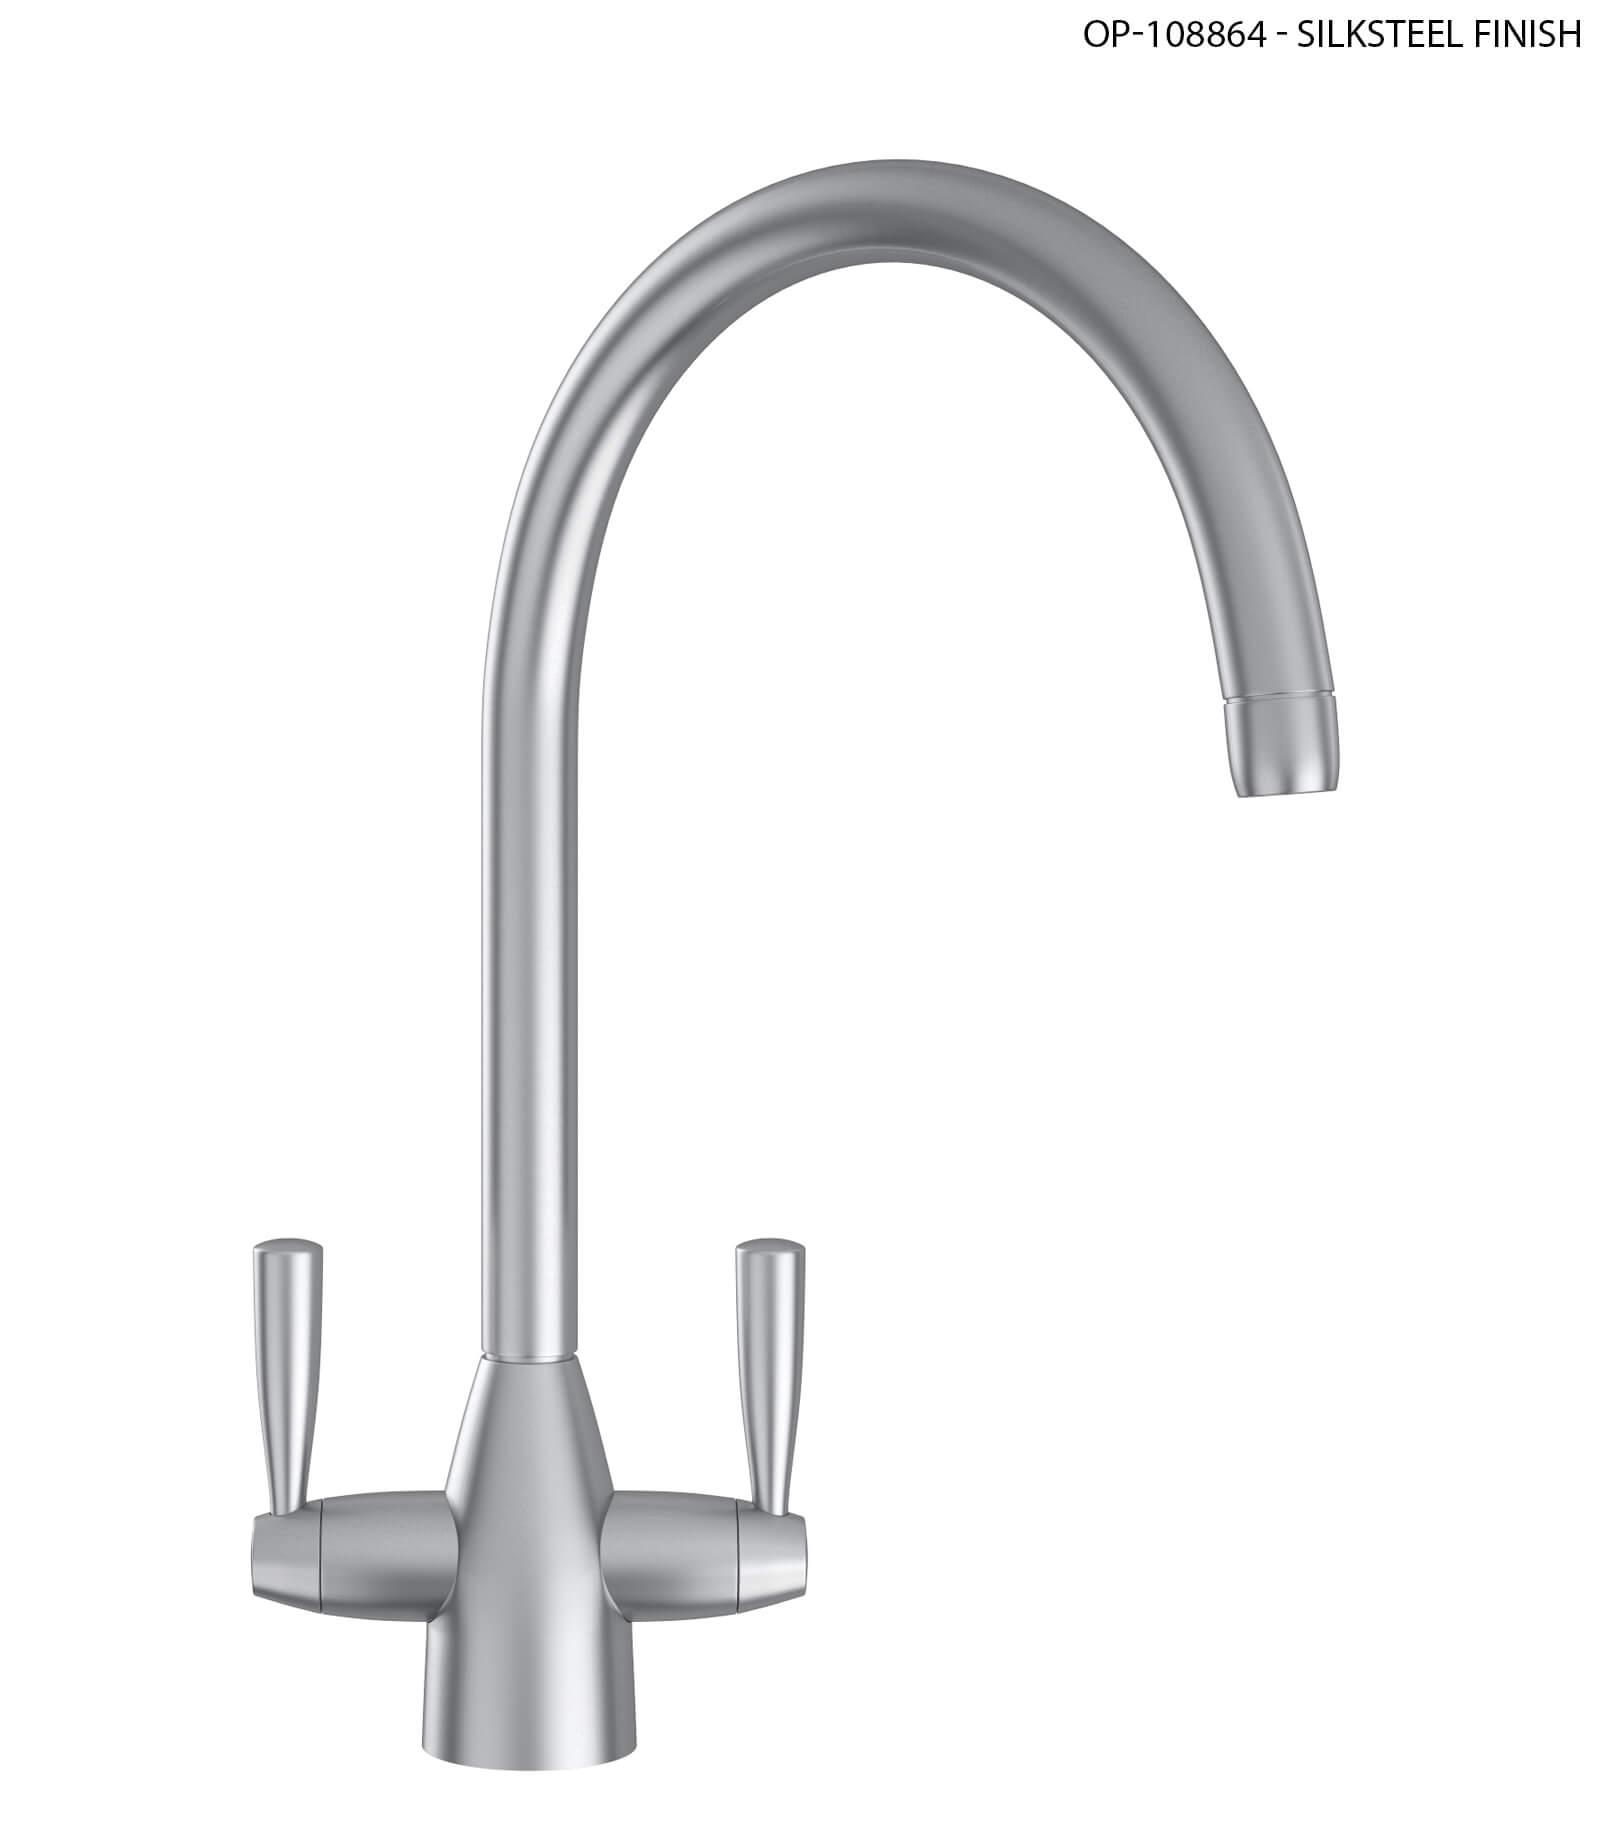 Franke Eiger Kitchen Sink Mixer Tap Chrome More Finish